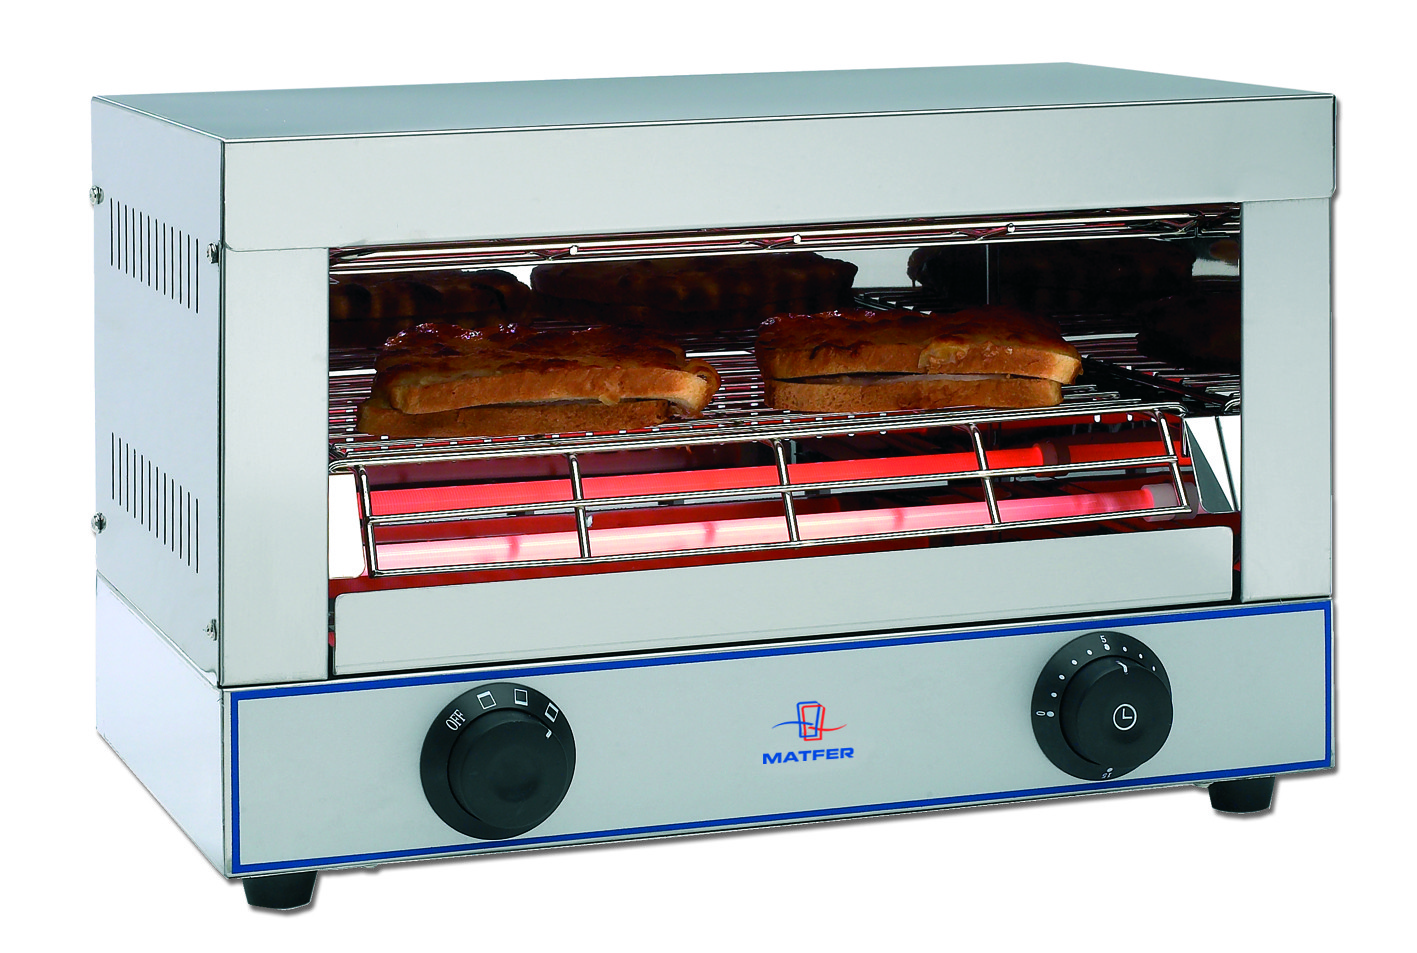 grill ou toasteur professionnel 1 tage ecolin matfer. Black Bedroom Furniture Sets. Home Design Ideas